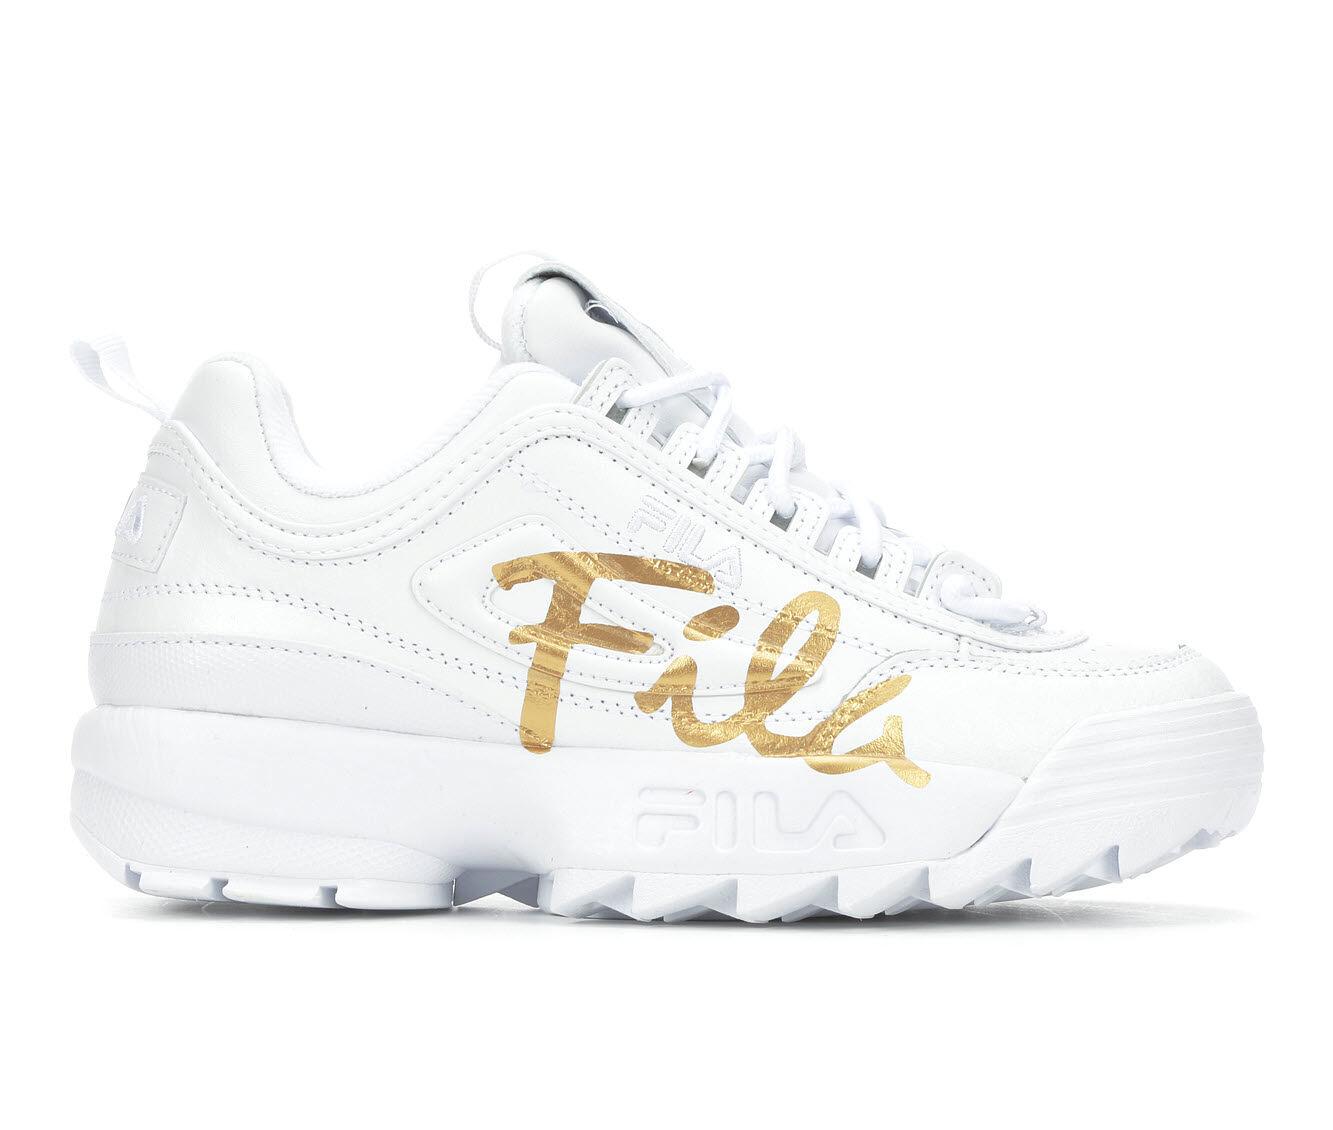 quality guaranteed Women's Fila Disruptor II Script Sneakers White/Met Gold